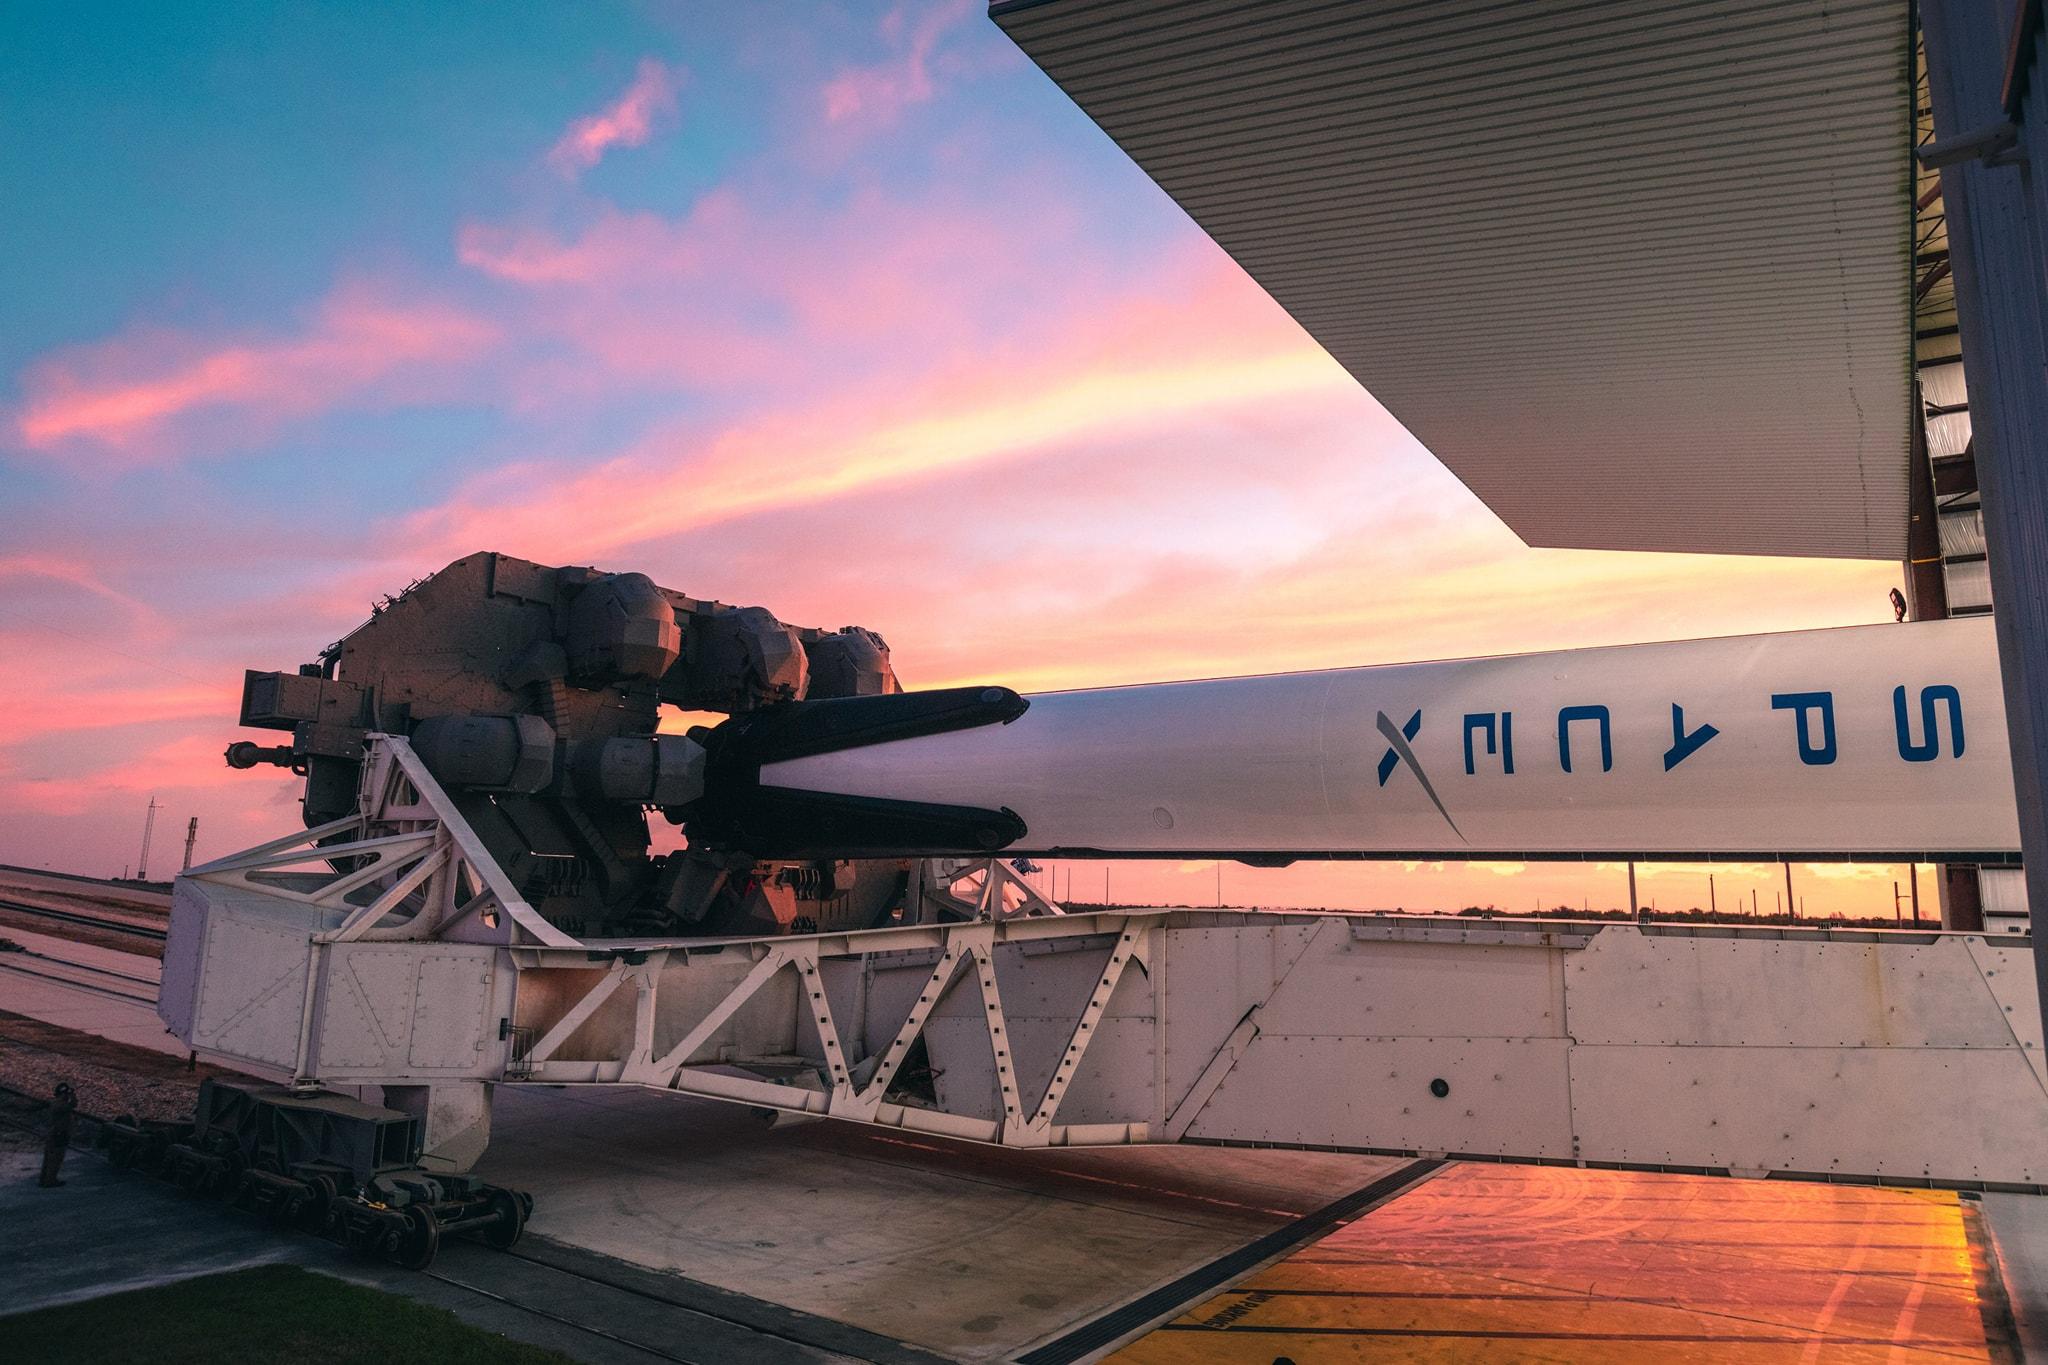 Fusée SpaceX de Elon Musk